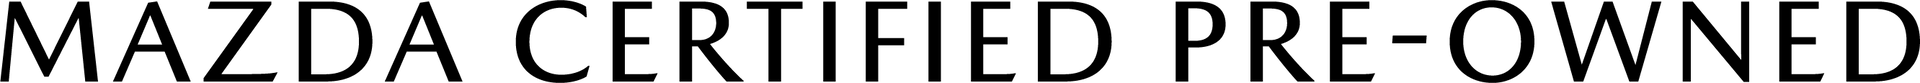 MAZDACertifiedPre-Ownedblack 2